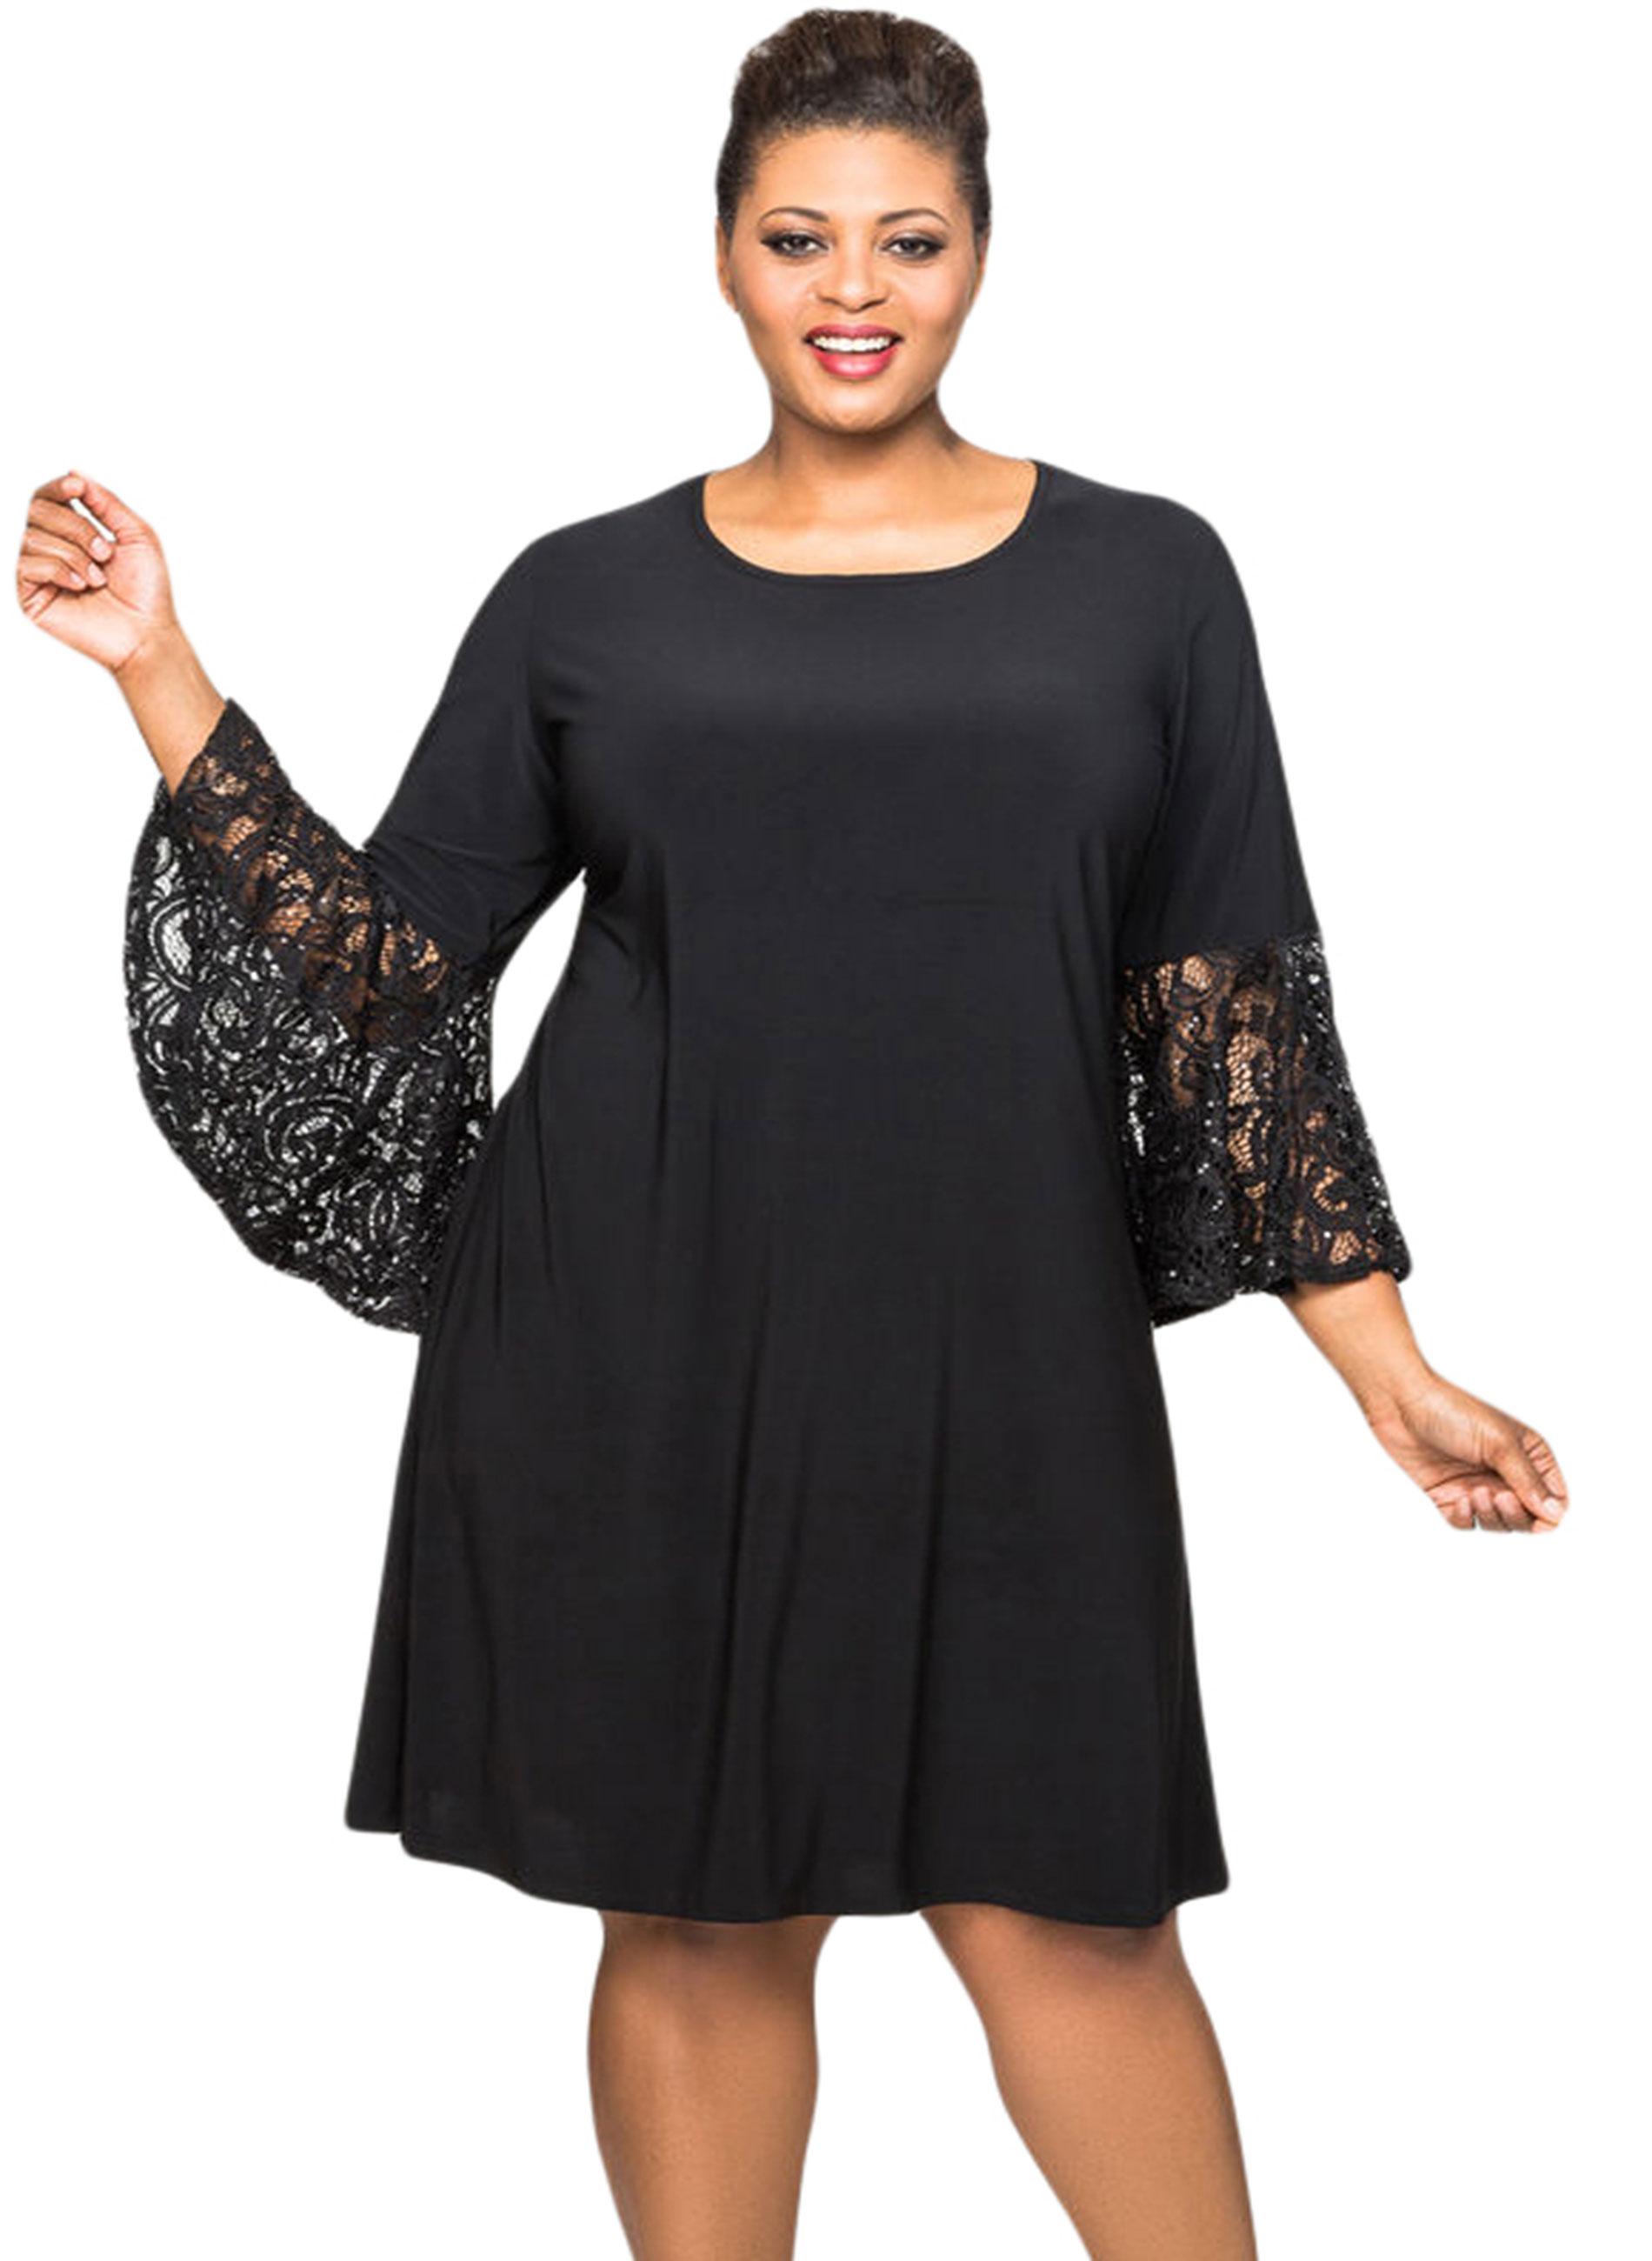 9461ac682e3e ΜΕΓΑΛΑ ΜΕΓΕΘΗ ΦΟΡΕΜΑΤΑ    Φόρεμα Μαύρο με Δαντελωτά Μανίκια Καμπάνα ...